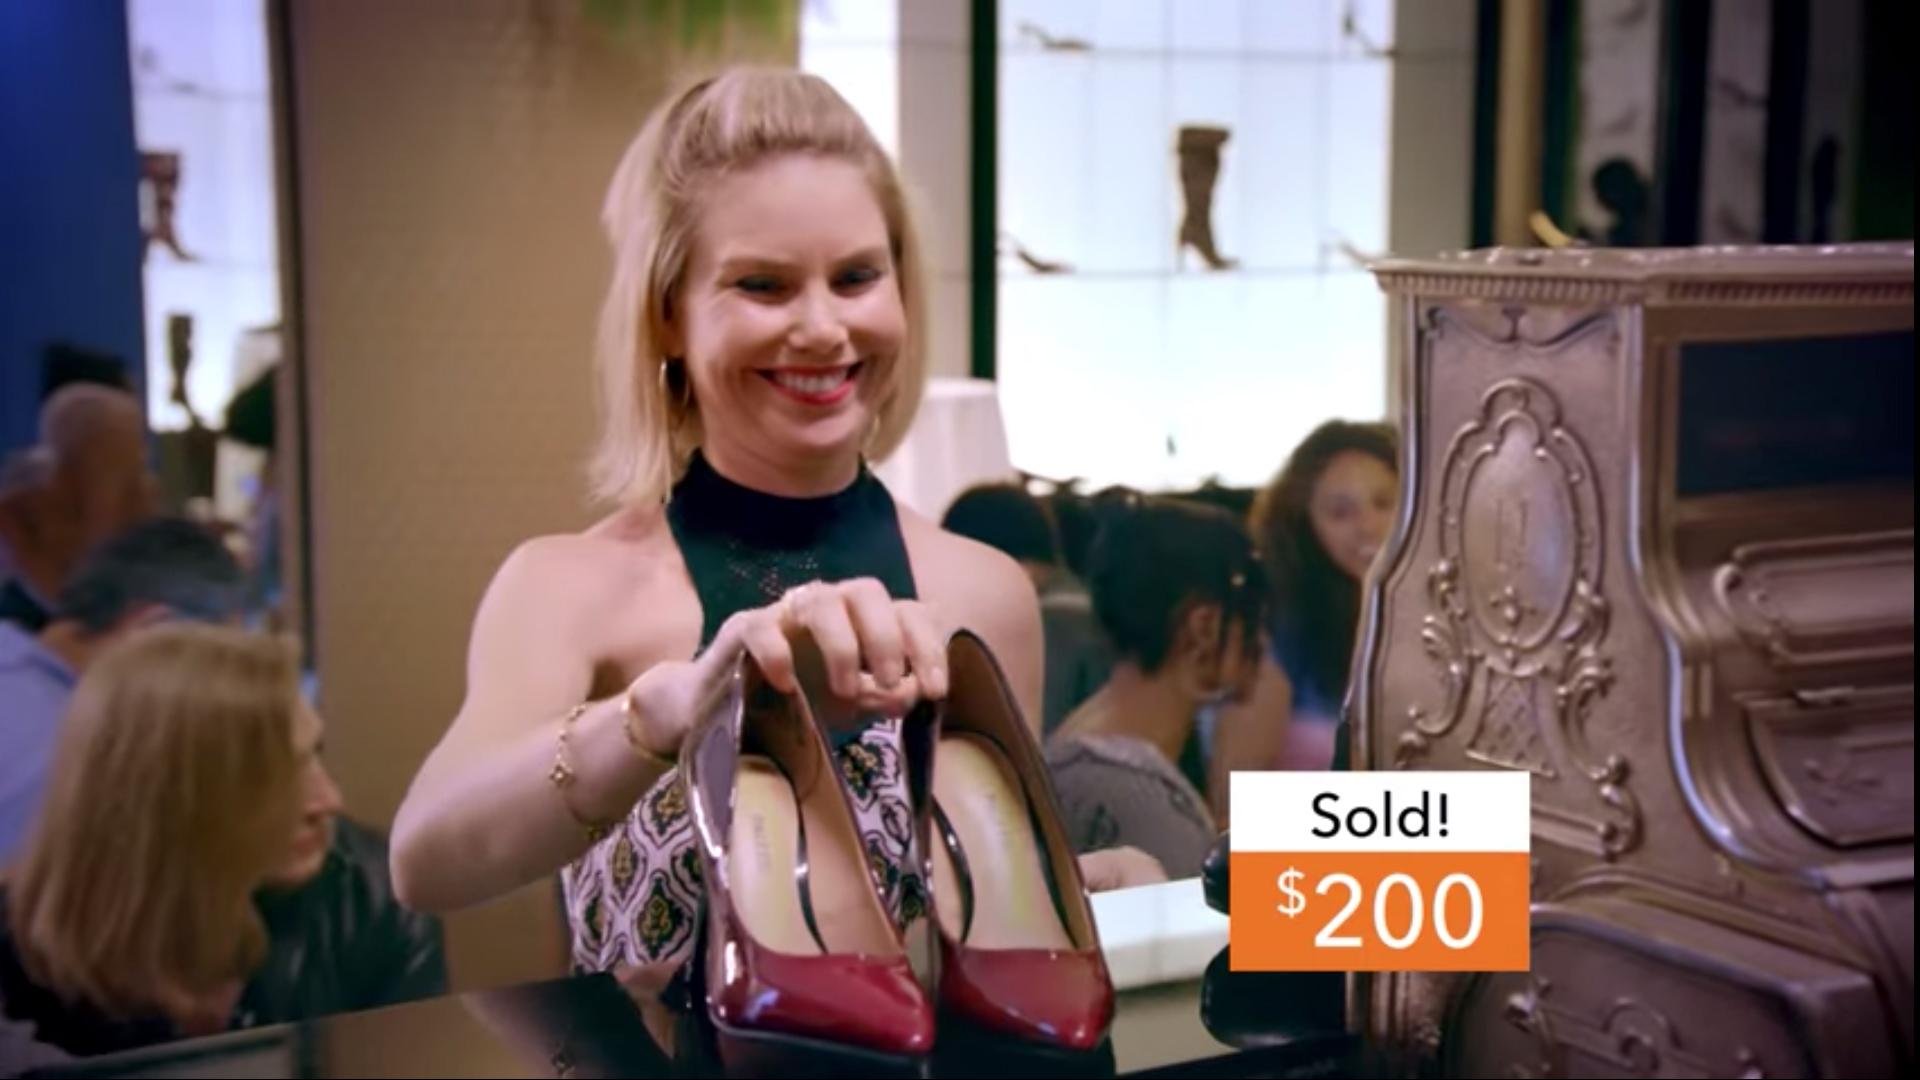 Schuh-Discounter Payless lässt Influencer in die Falle tappen